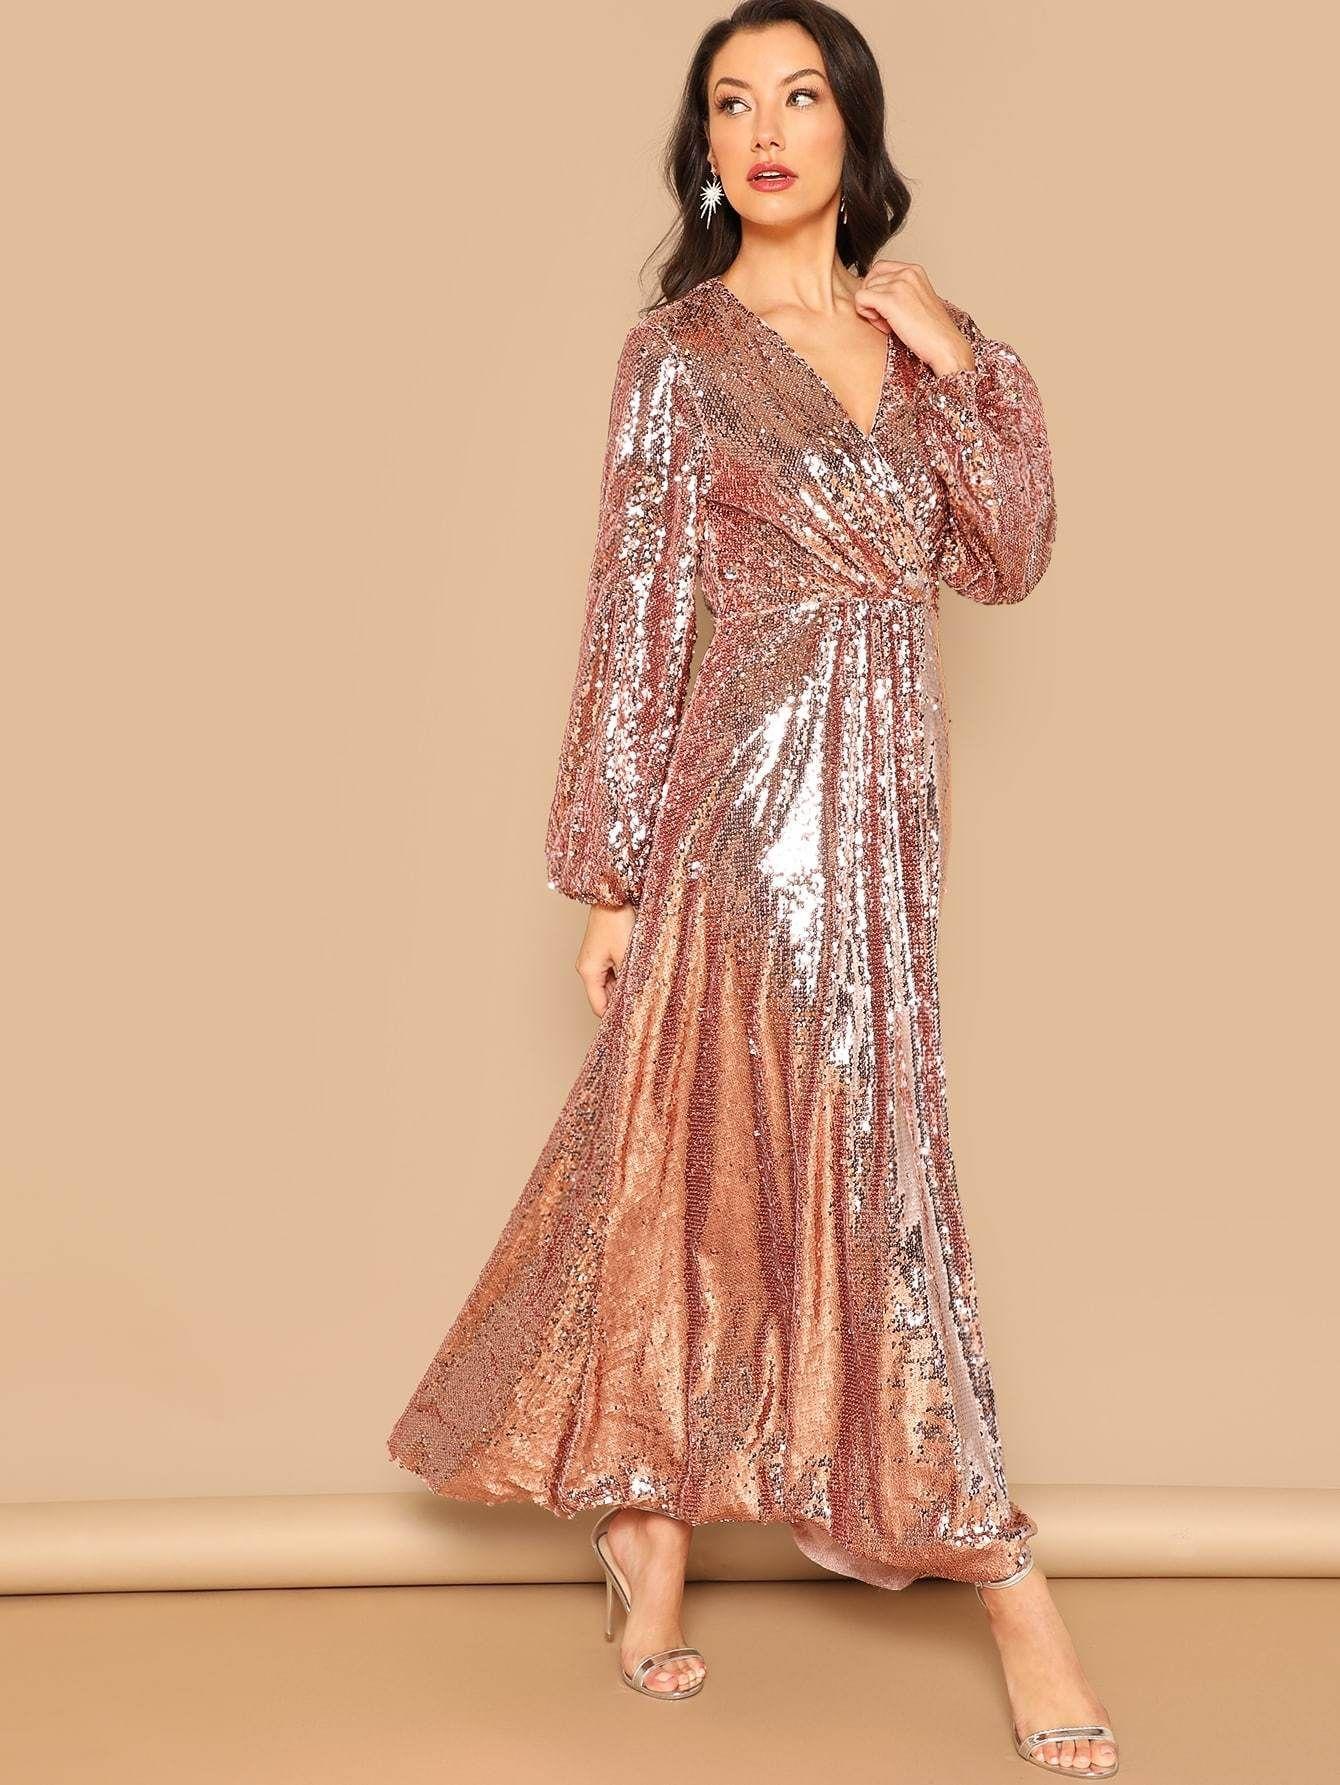 41+ Sequin long sleeve dress ideas